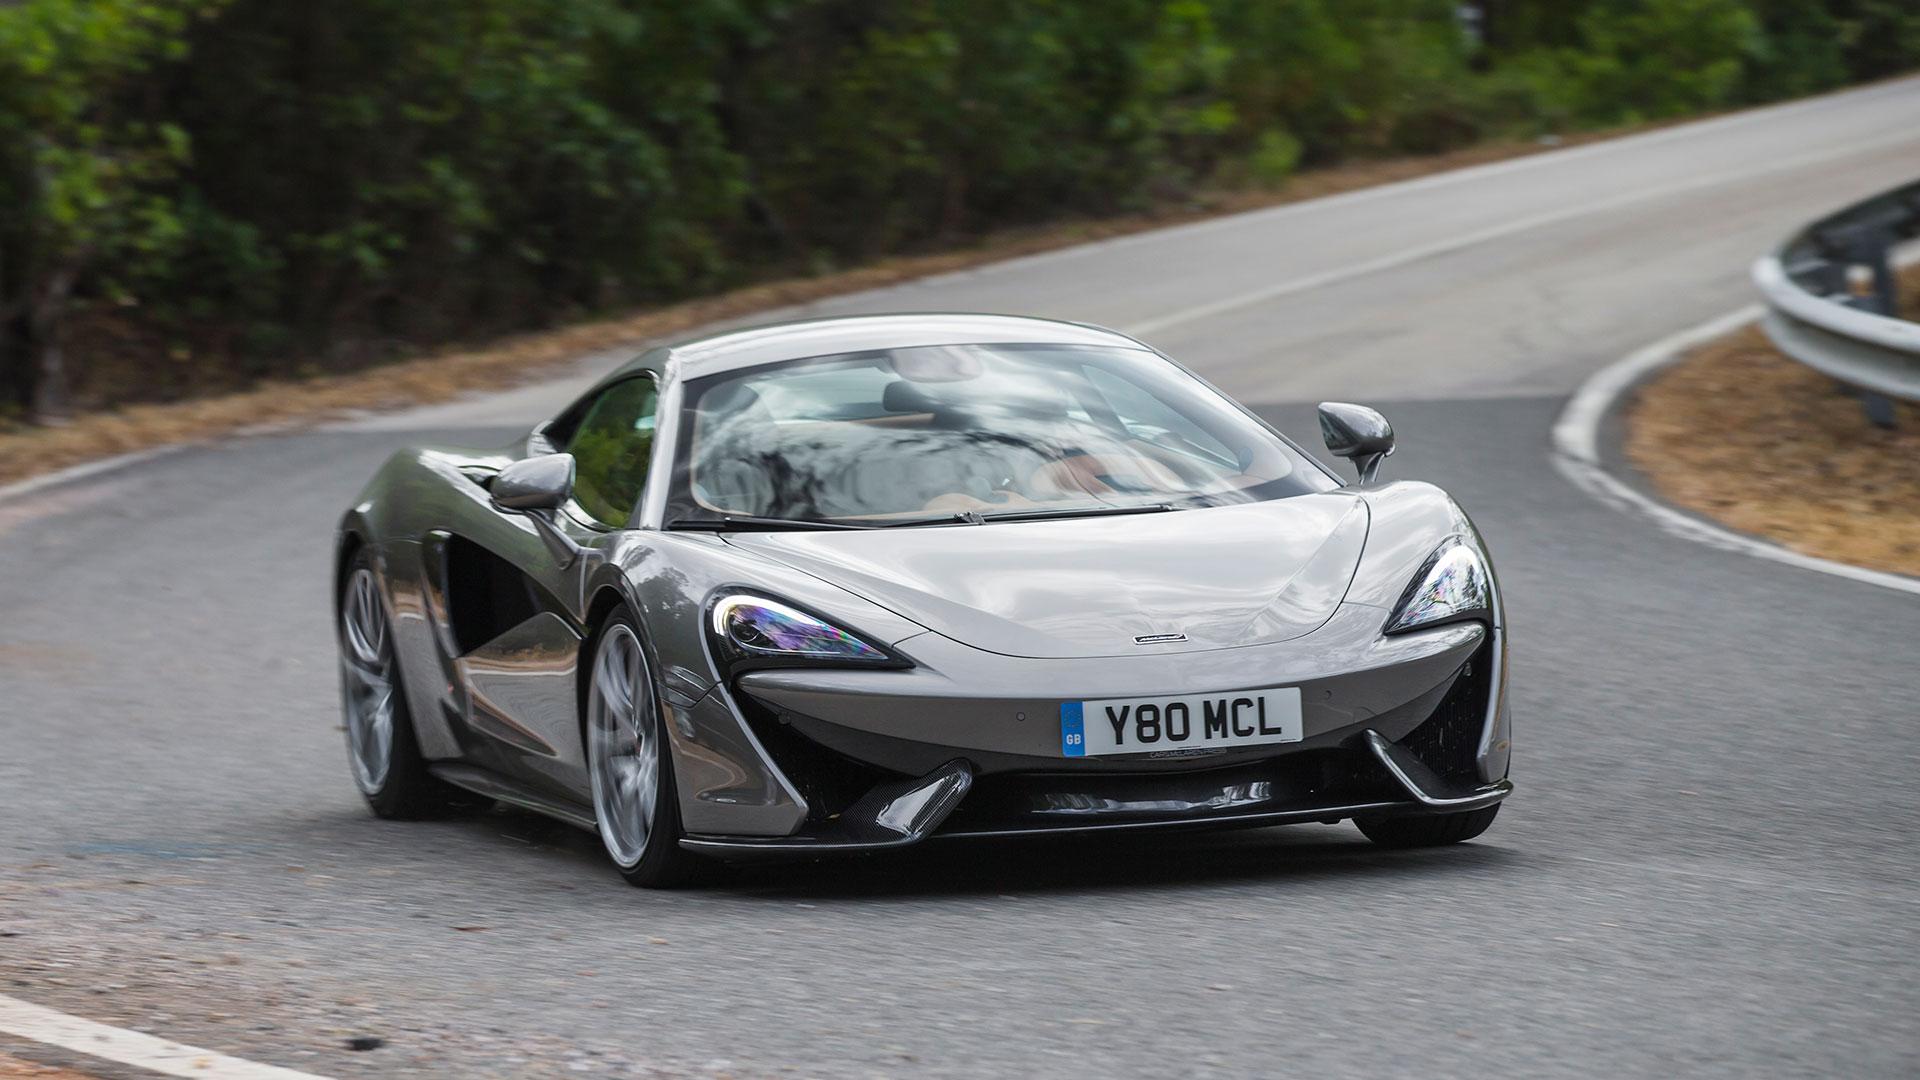 Mclaren New Mclaren Cars For Sale Auto Trader Uk